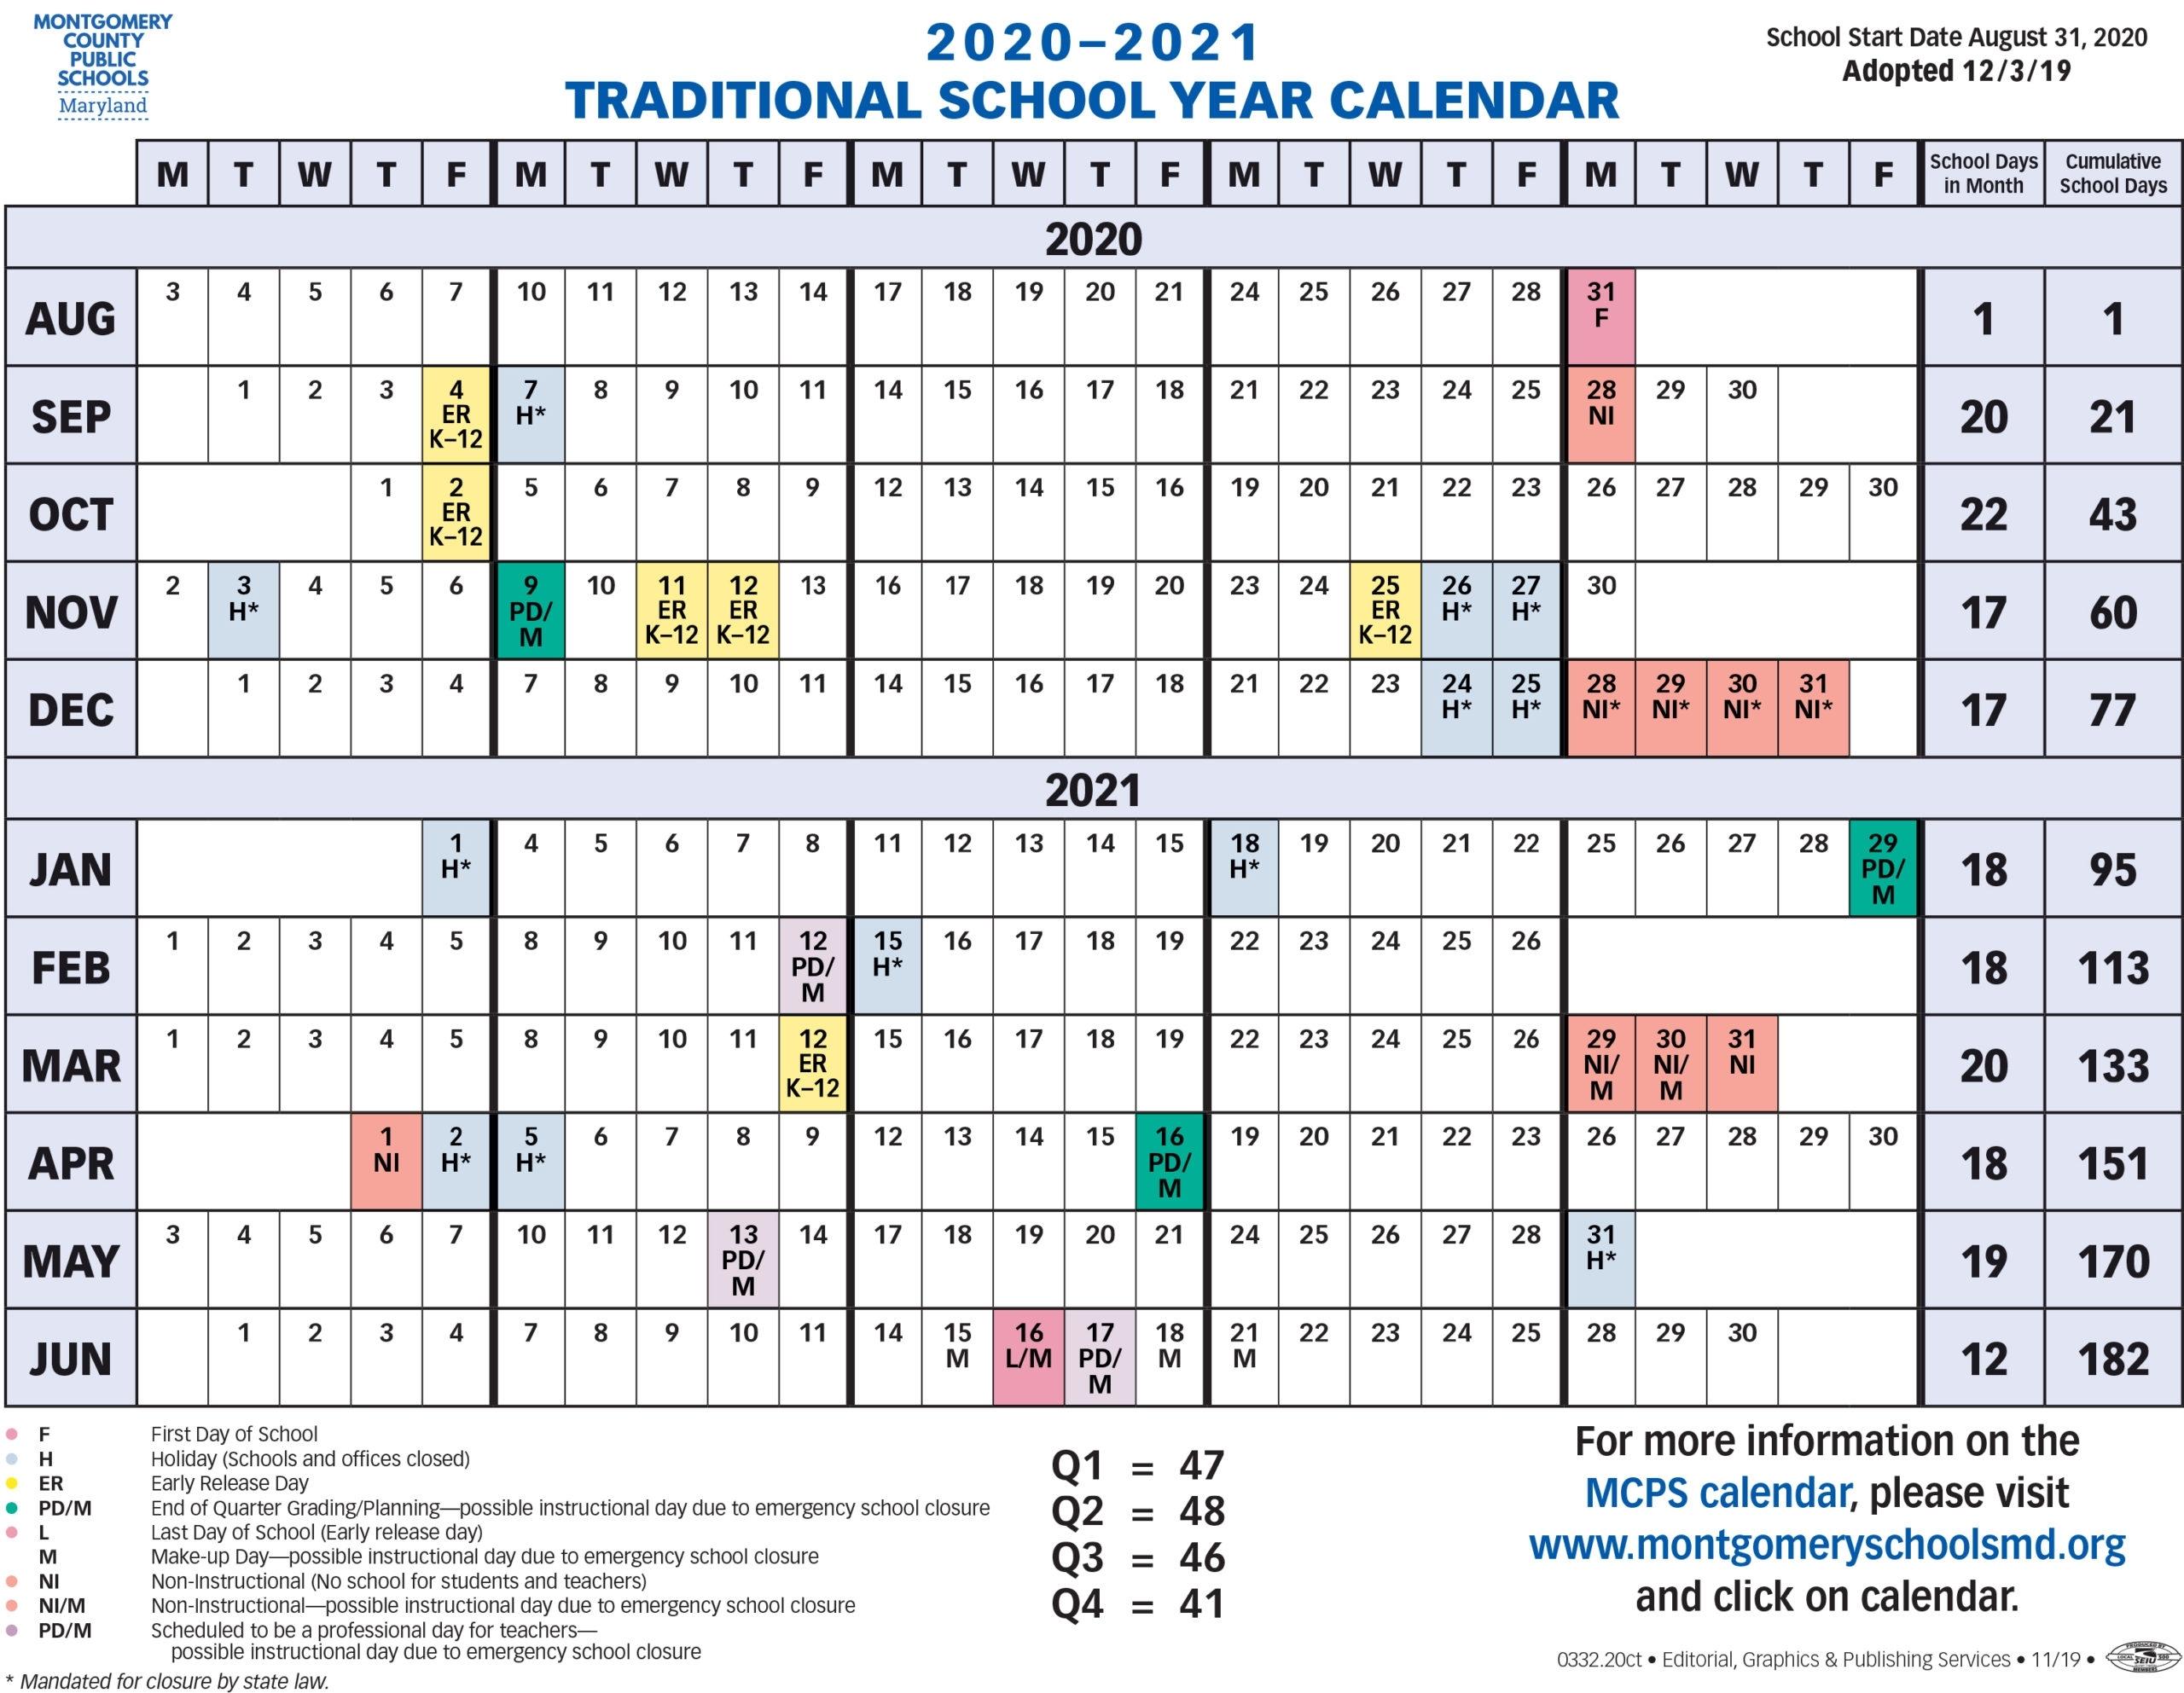 Payroll Calendar Cps 2021 | Payroll Calendar 2021